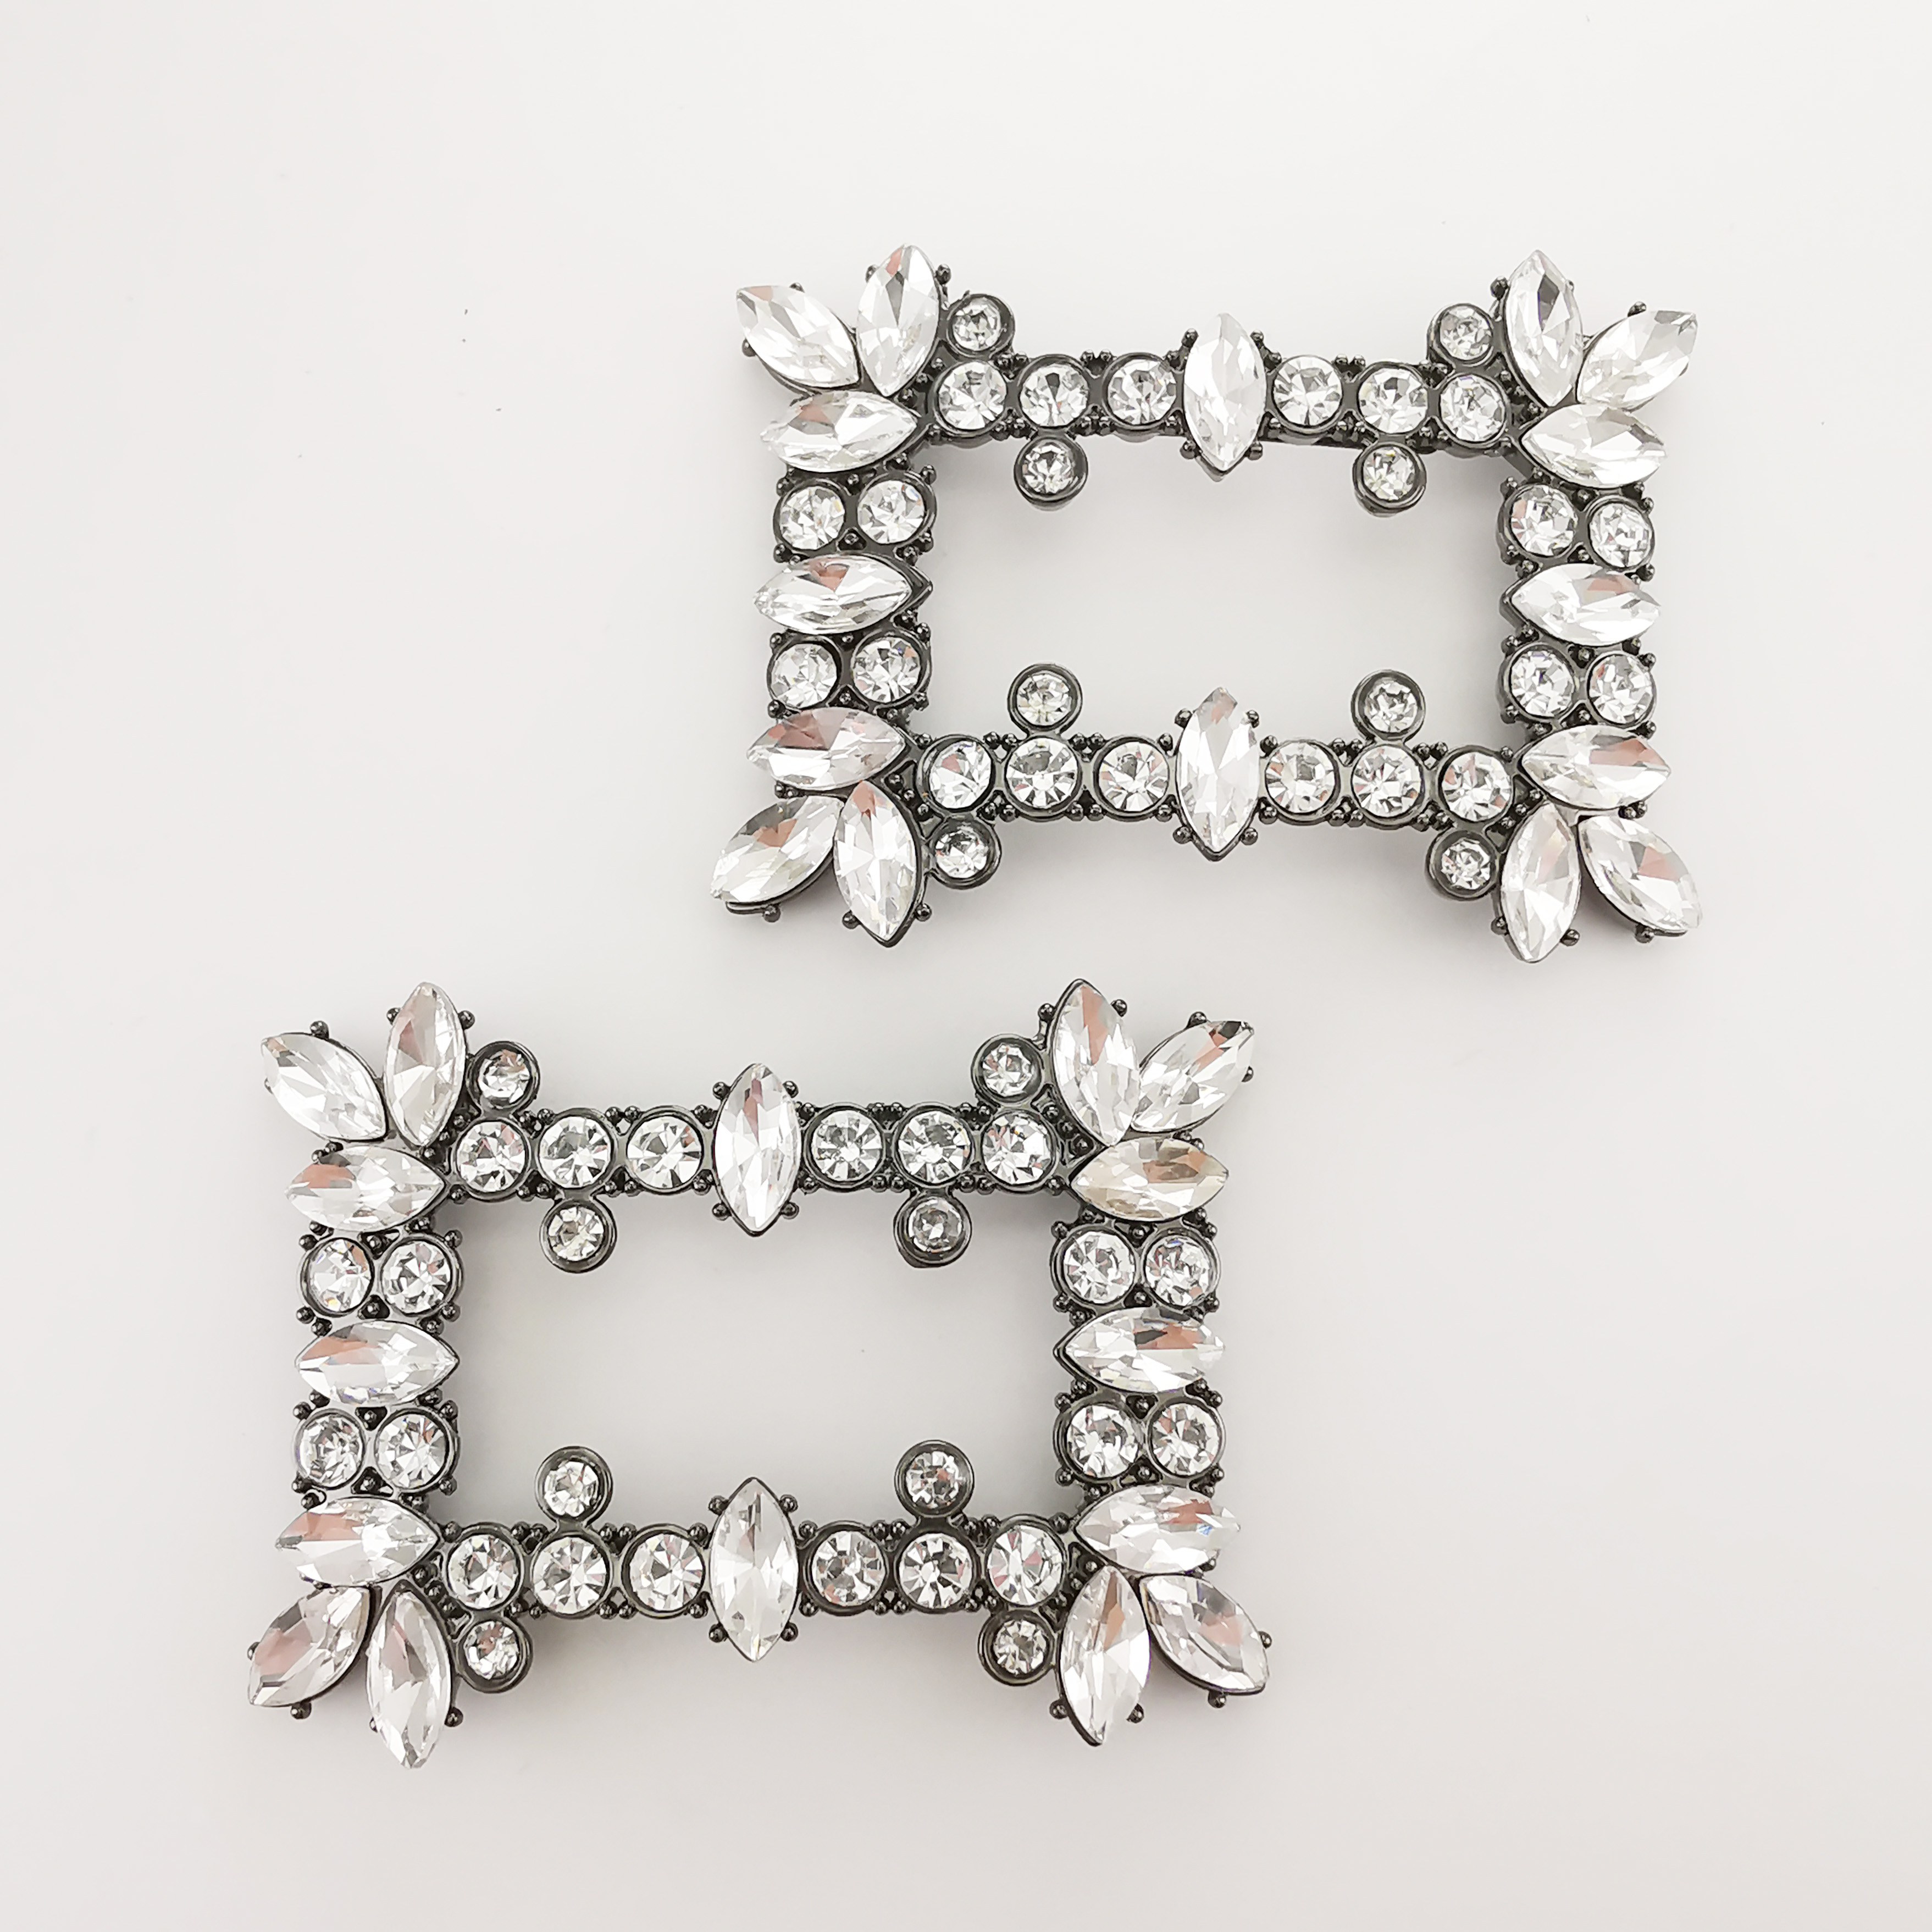 crystal stone rhinestone  shoe  buckle  decoration